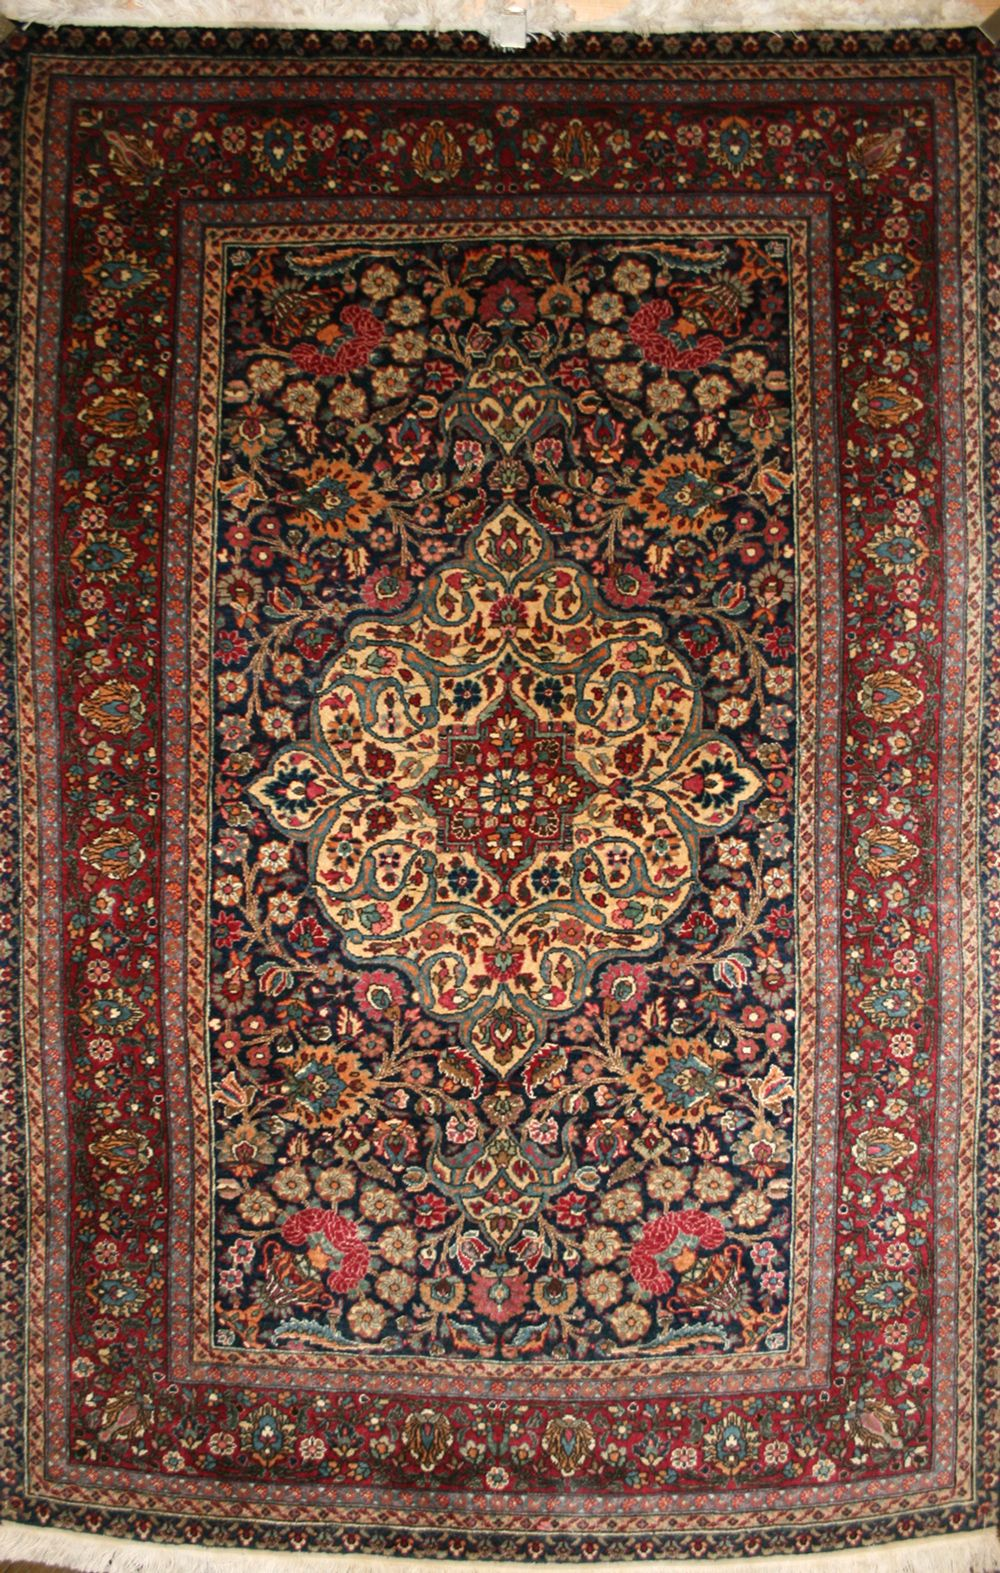 Beautiful Mashad Rug 163 2495 Persia 絨毯 Y ペルシャ絨毯